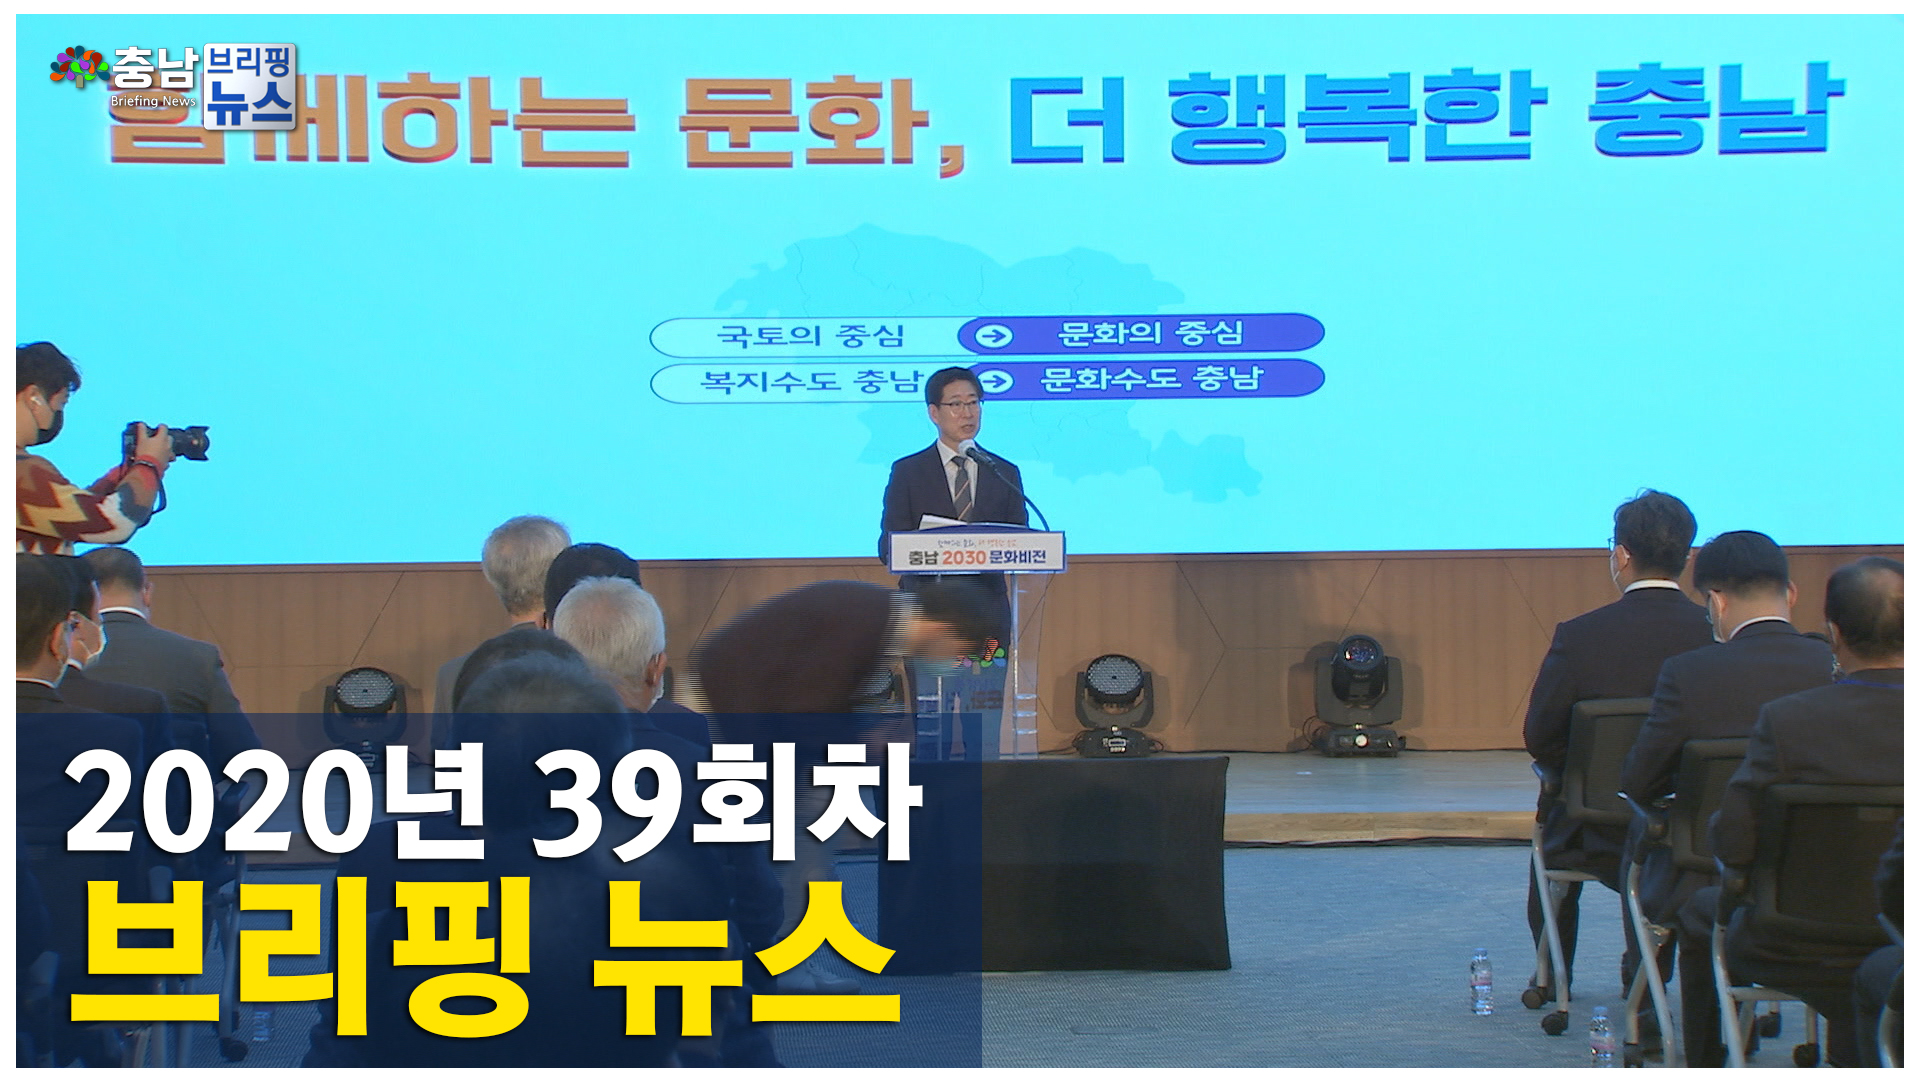 [NEWS]2020년 39회차 브리핑뉴스